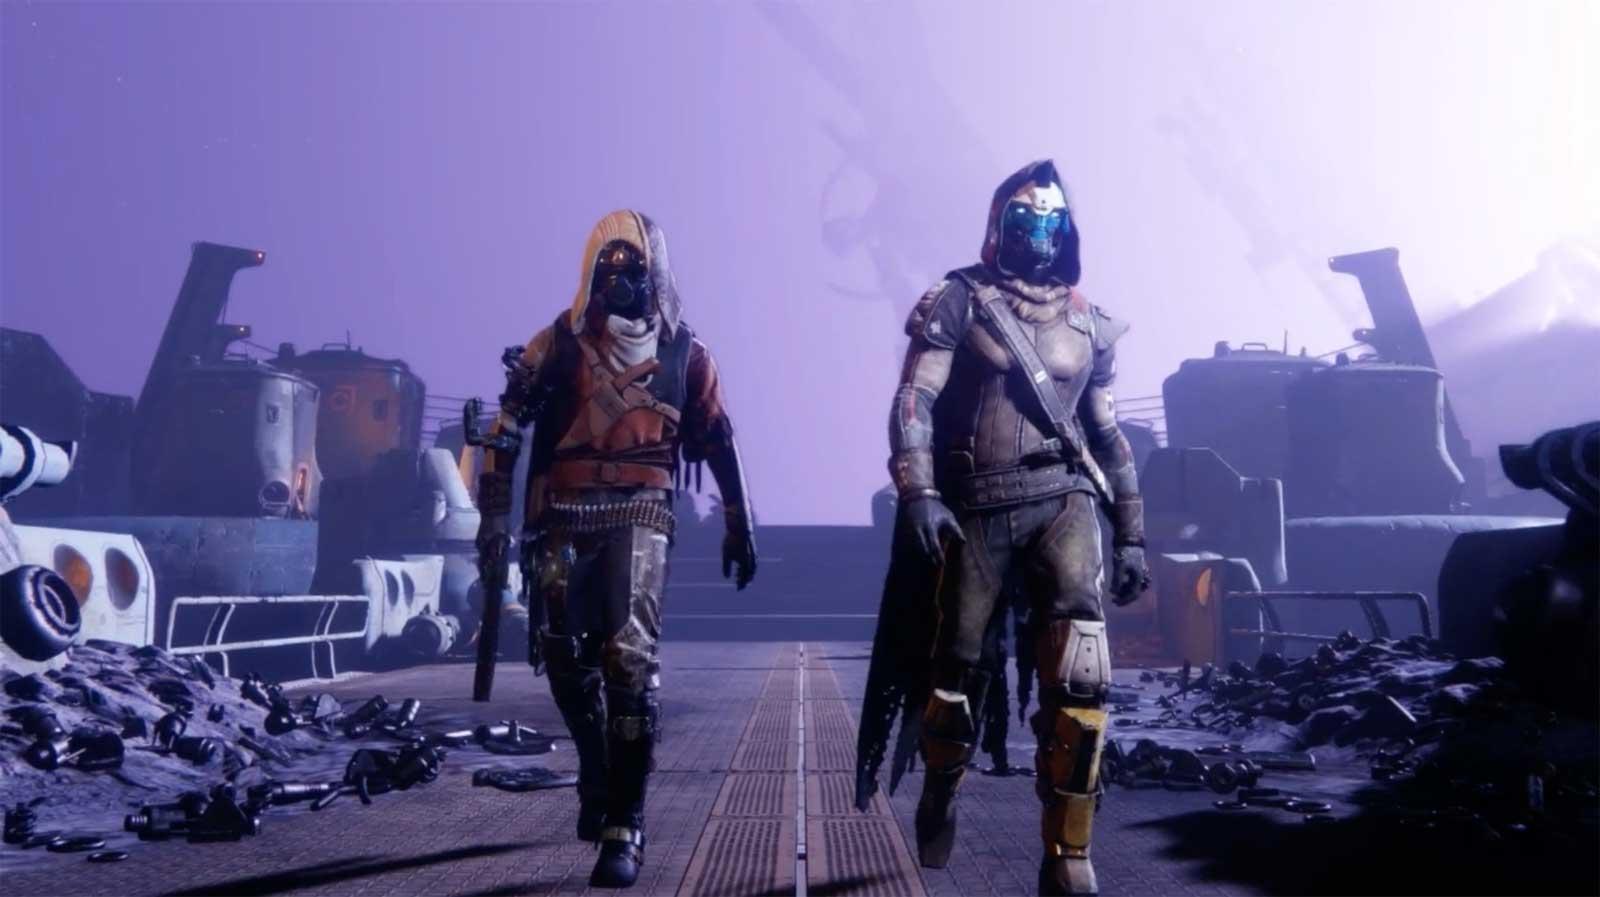 destiny 2 bilder 7 - 7 Destiny 2 bilder